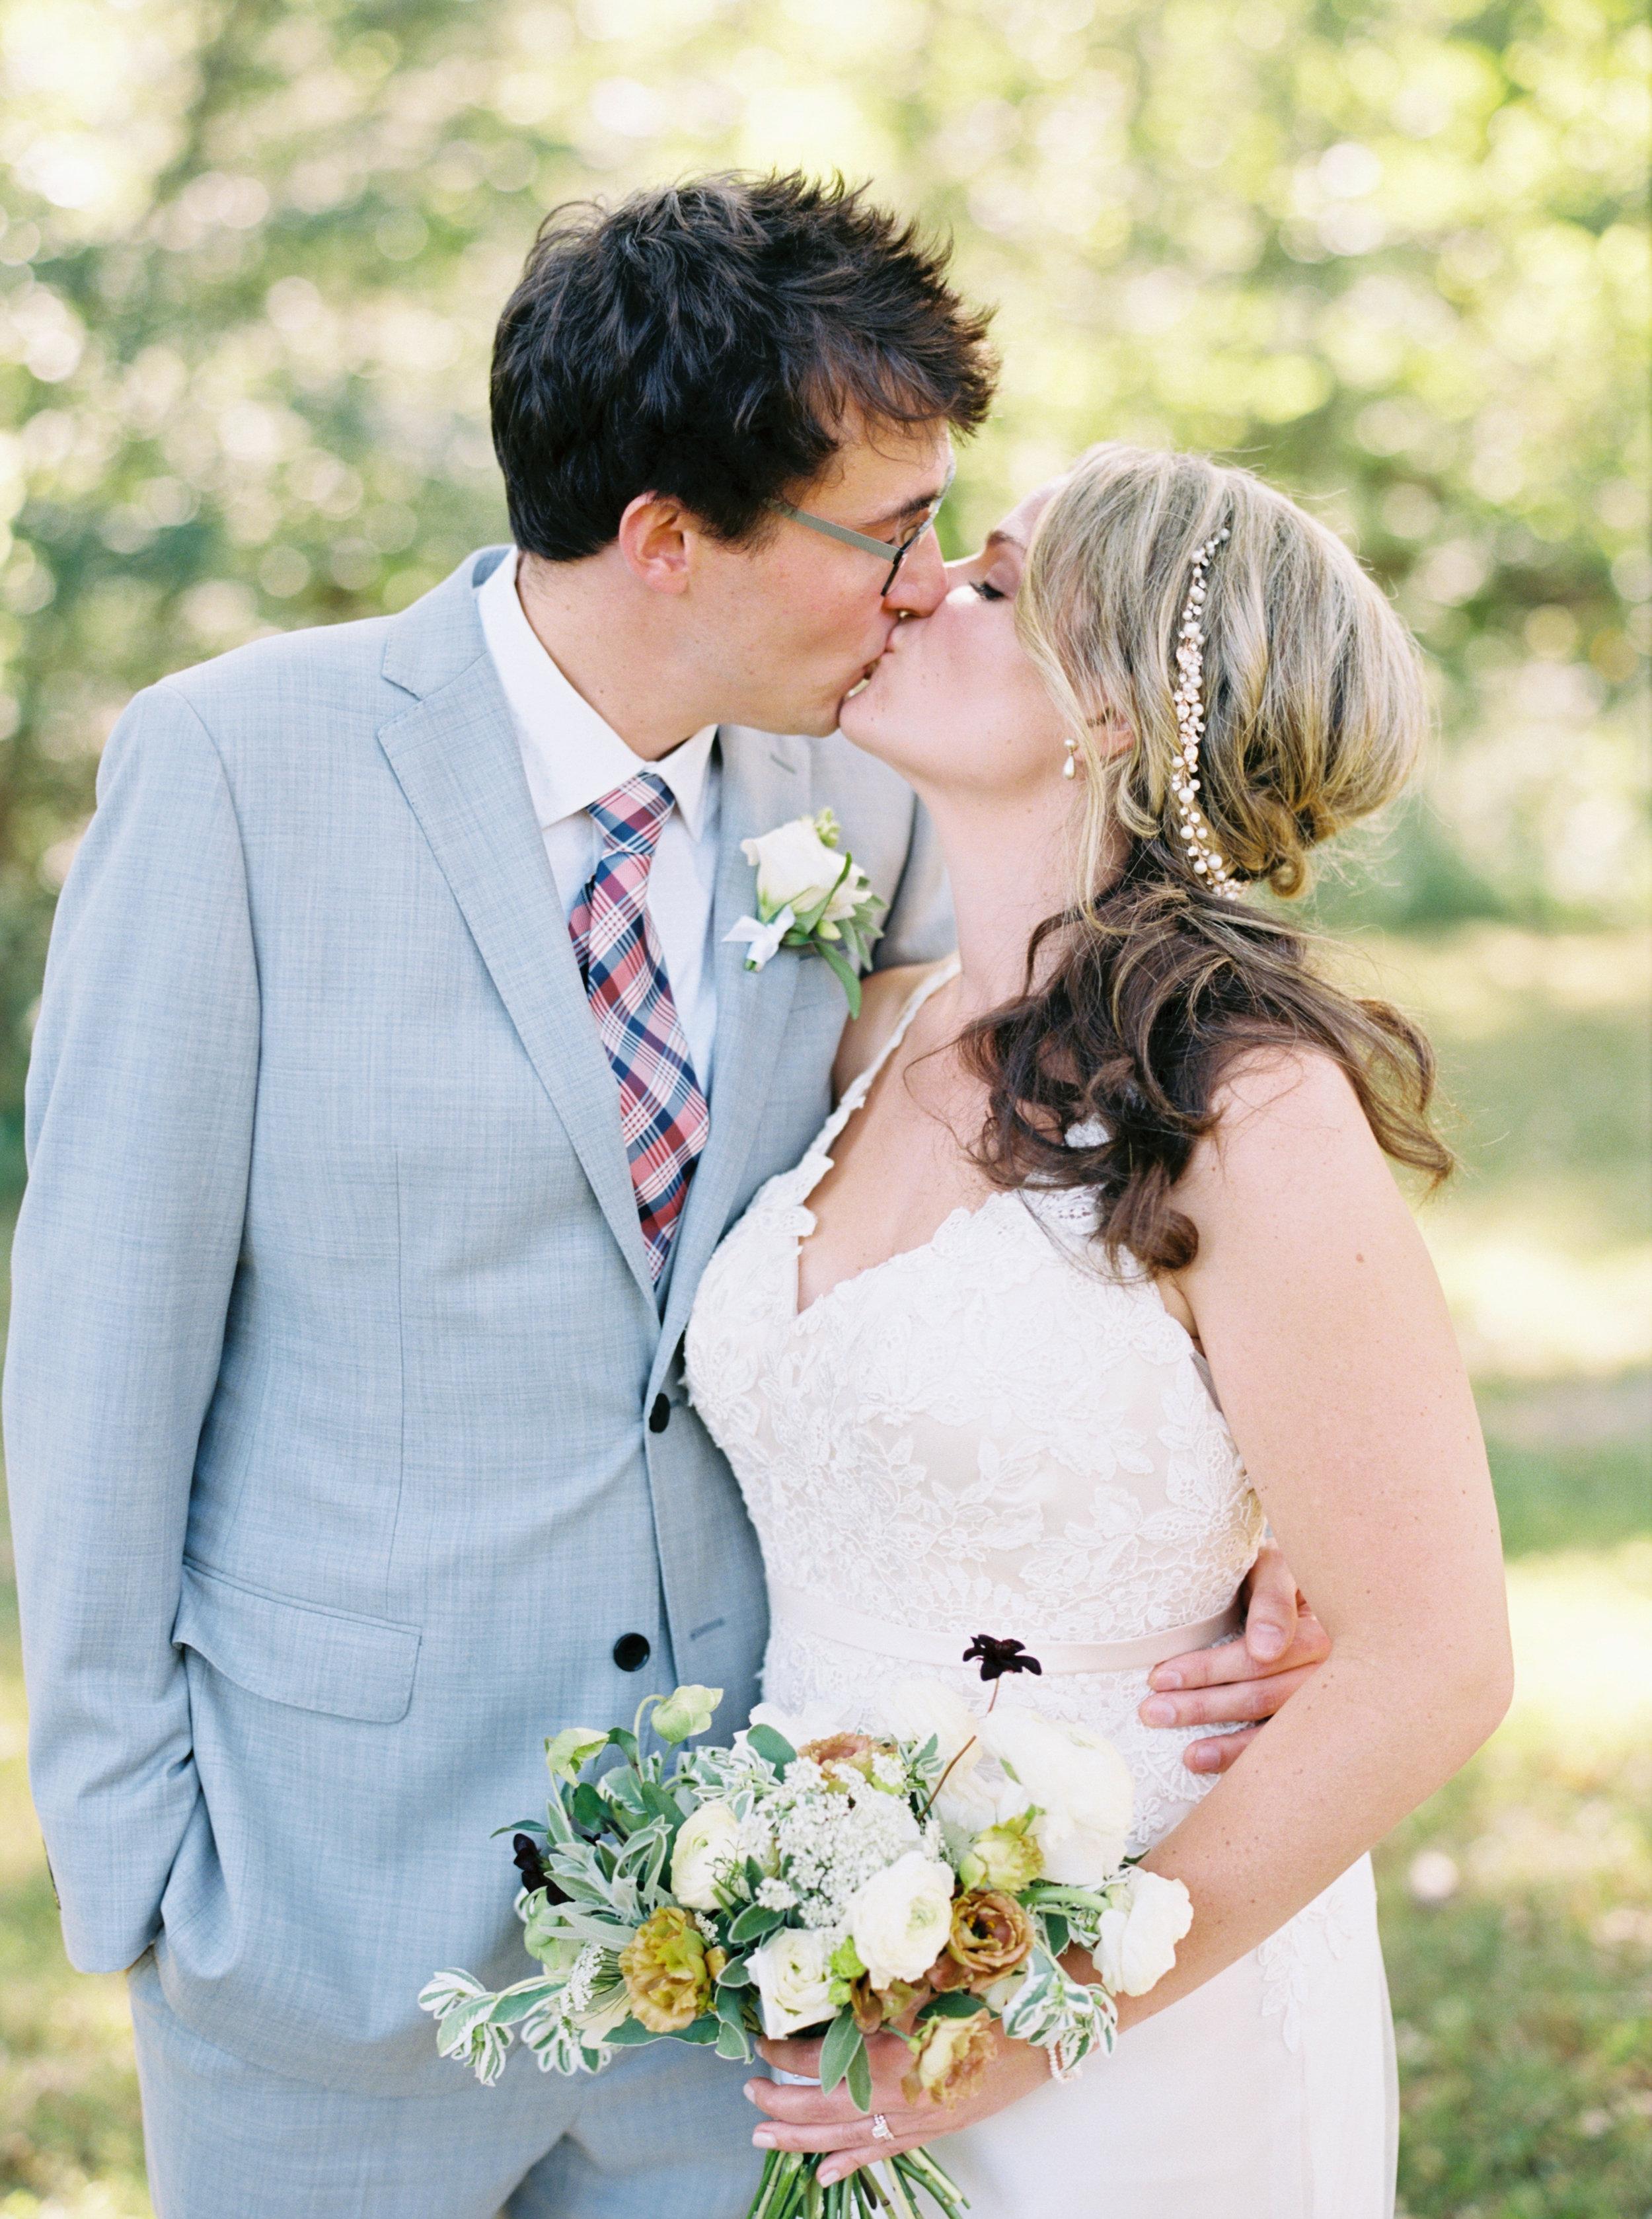 Abby_Simon_Wedding_Abigail_Malone_Photography_nashville_Bloomsbury_Farm-228.jpg